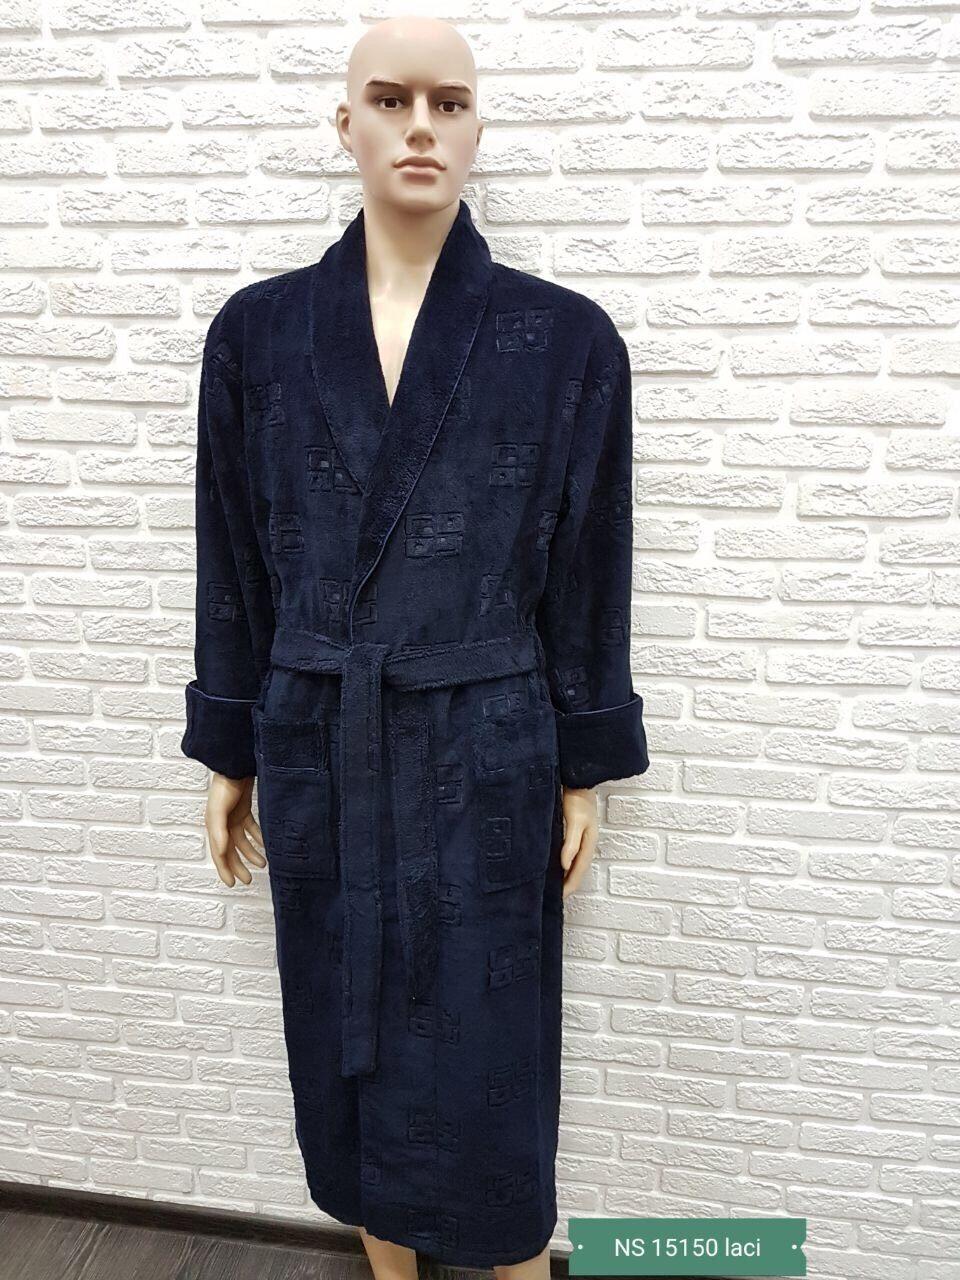 dd39446e55a6035 Халат мужской Трига жаккард длинный шалька L/XL, цвет: синий, Nusa-